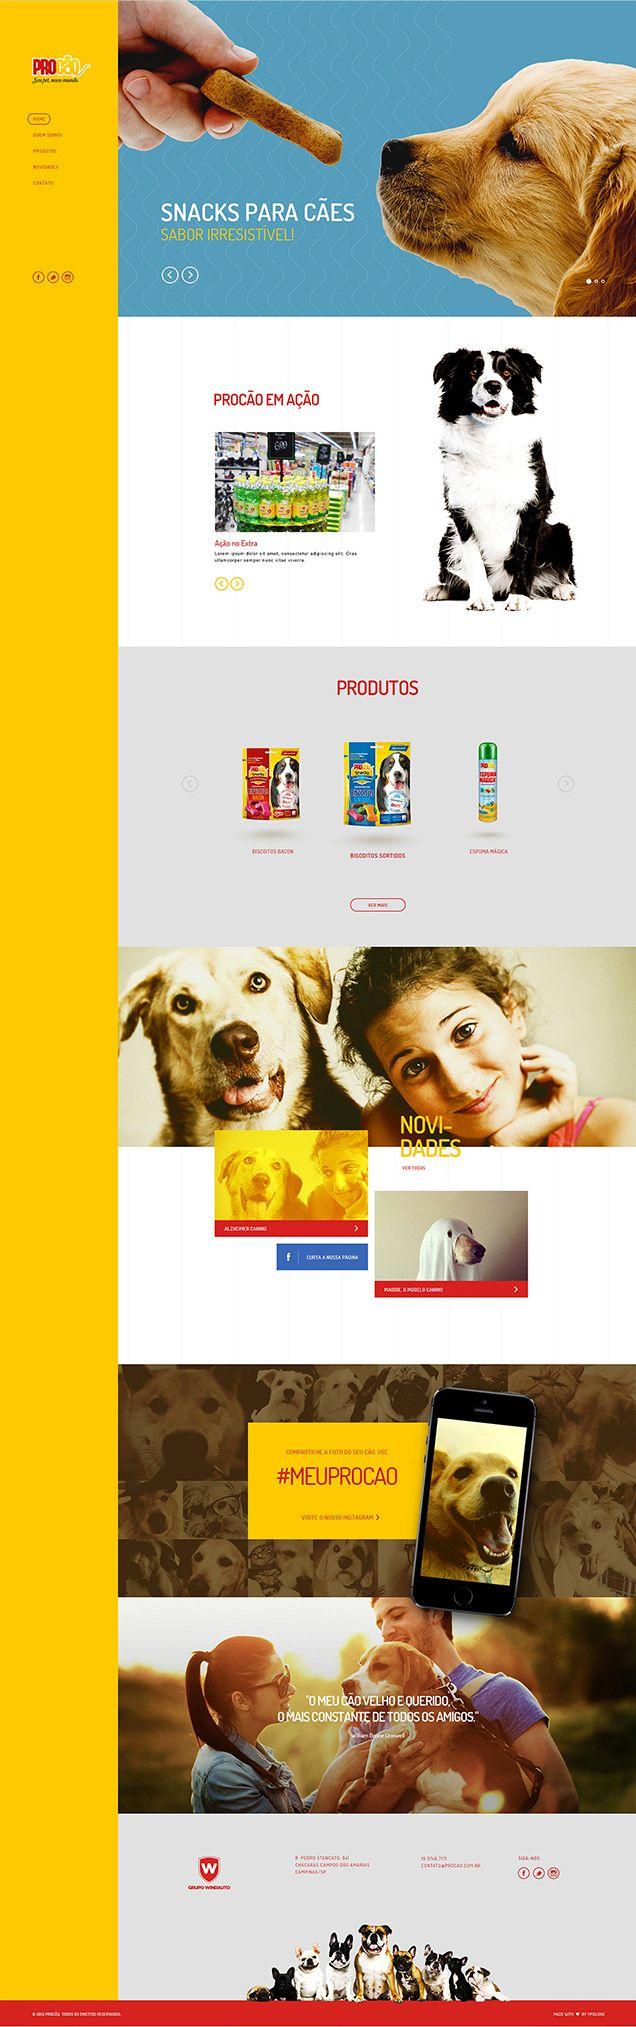 Procão Website Design by Fabiano Procópio #website #website #goodstuff